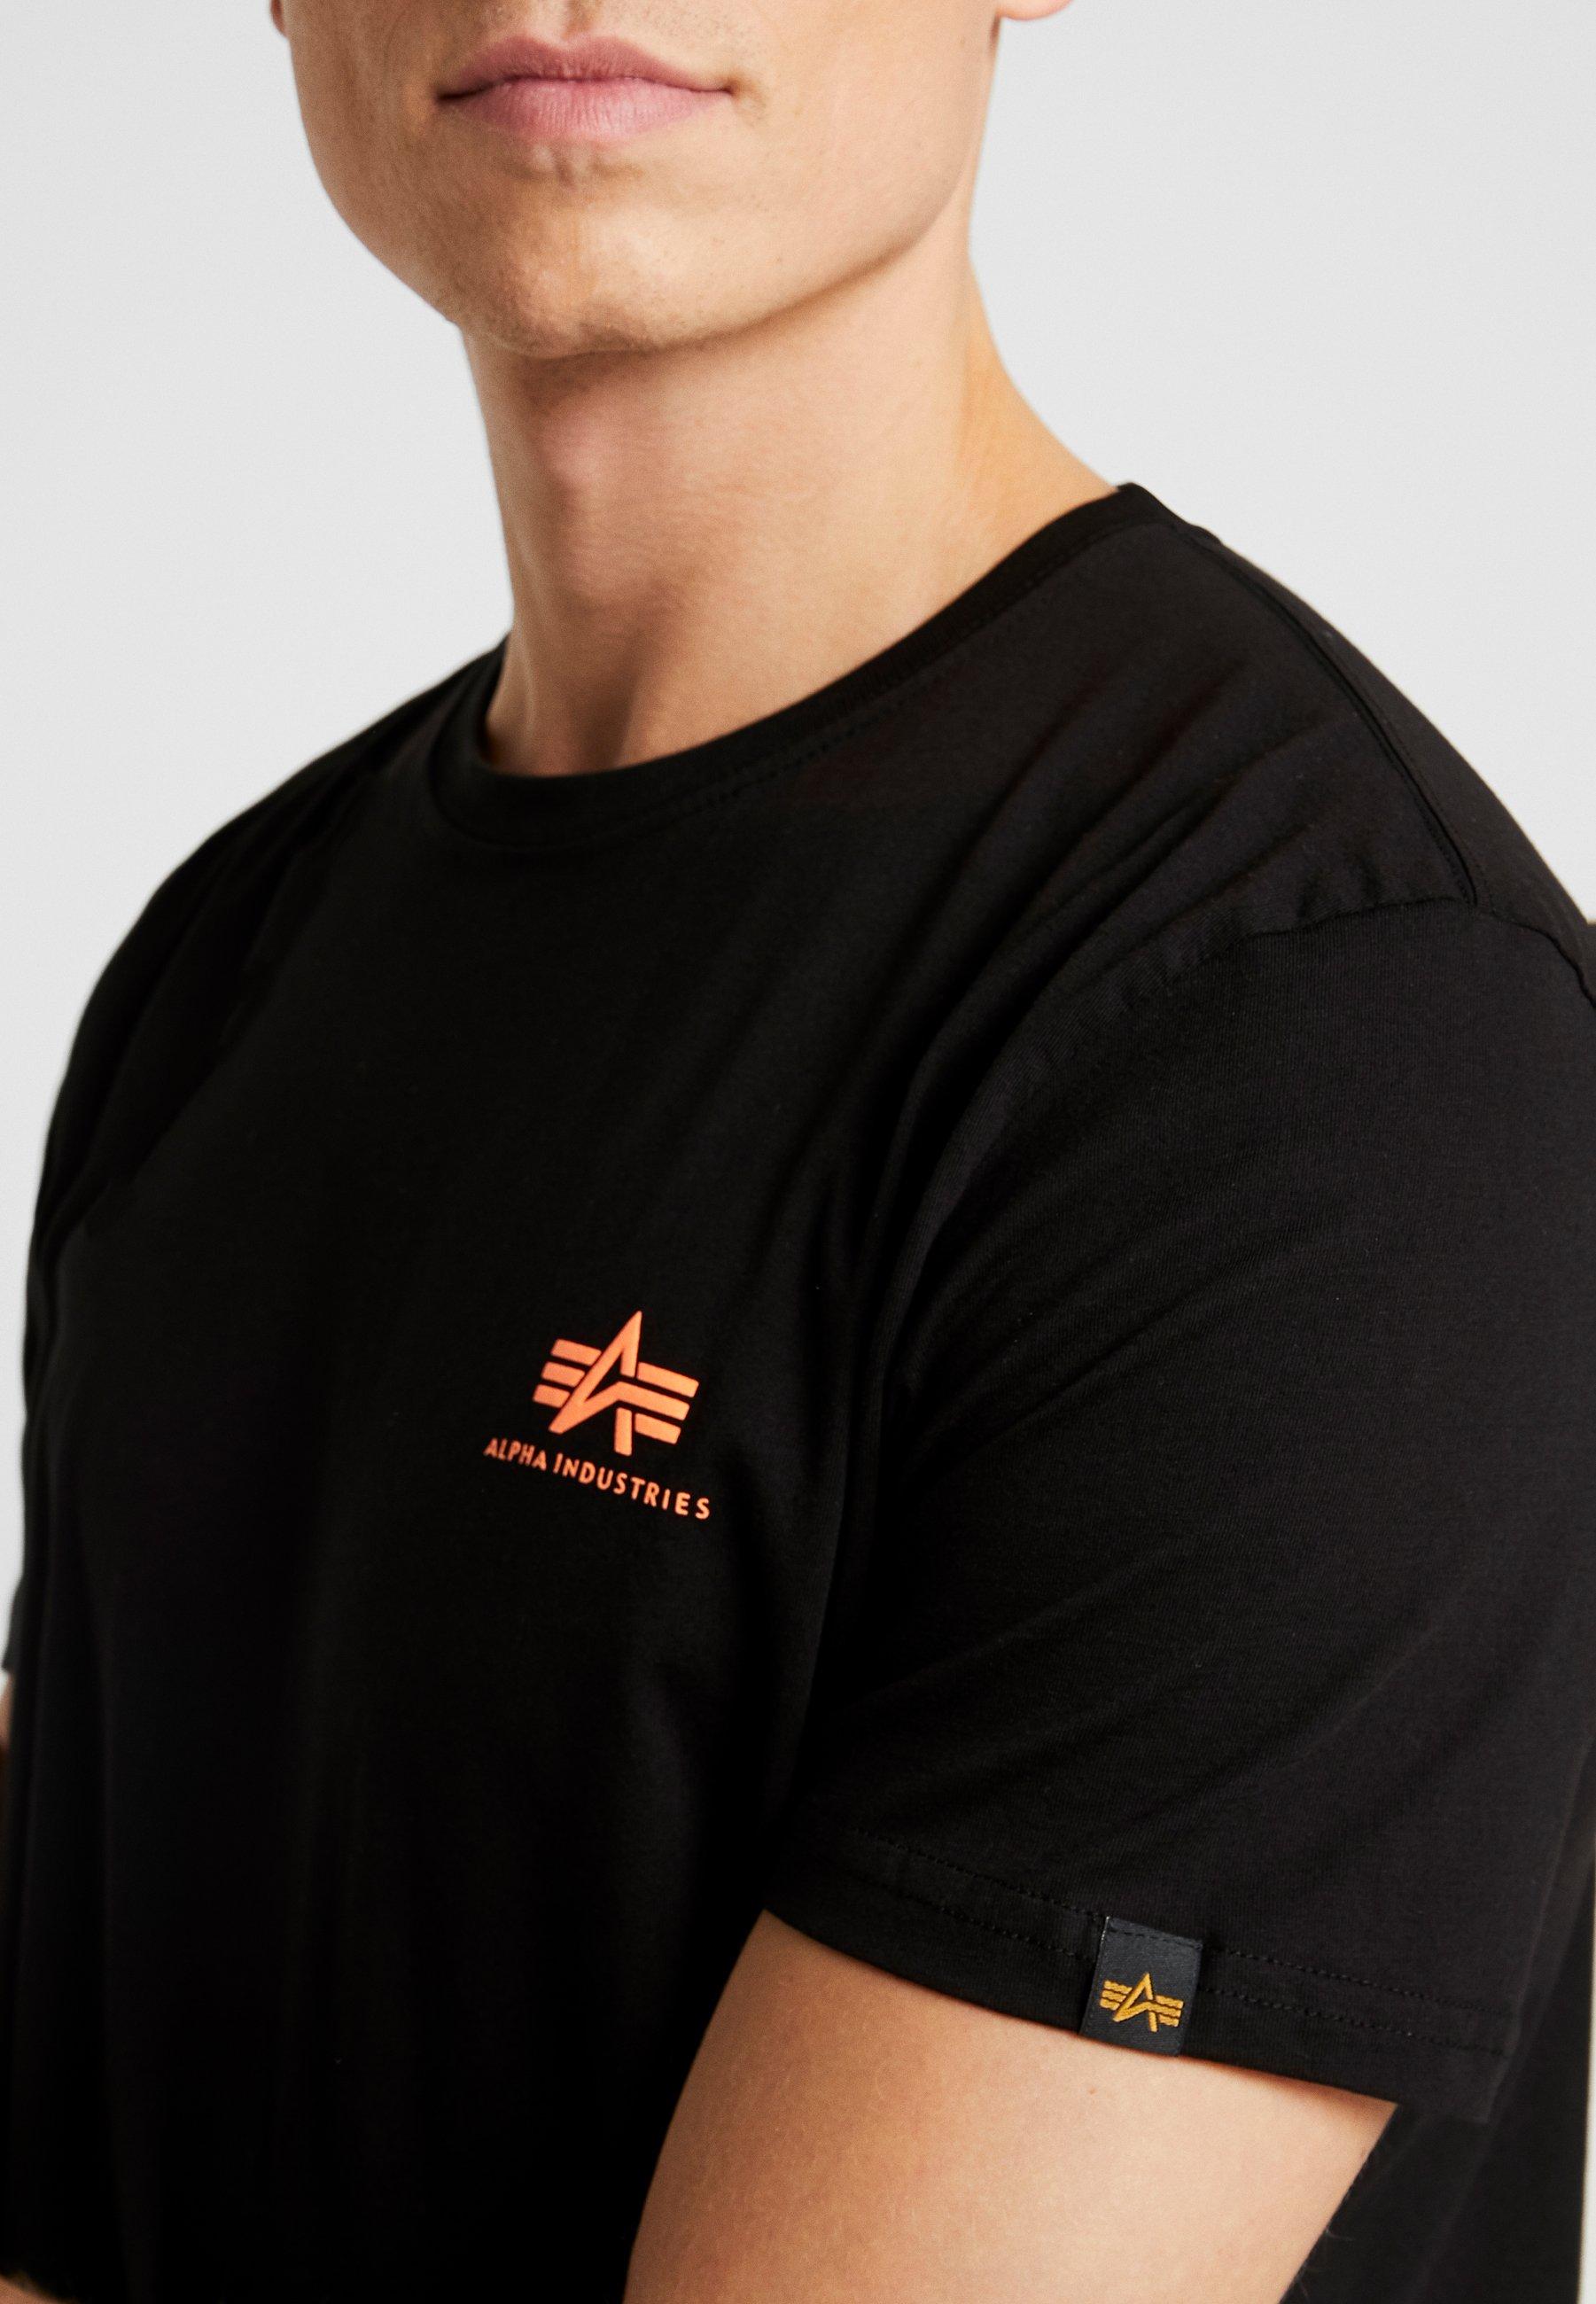 Alpha Industries Print T-shirt - black / neon orange peThm